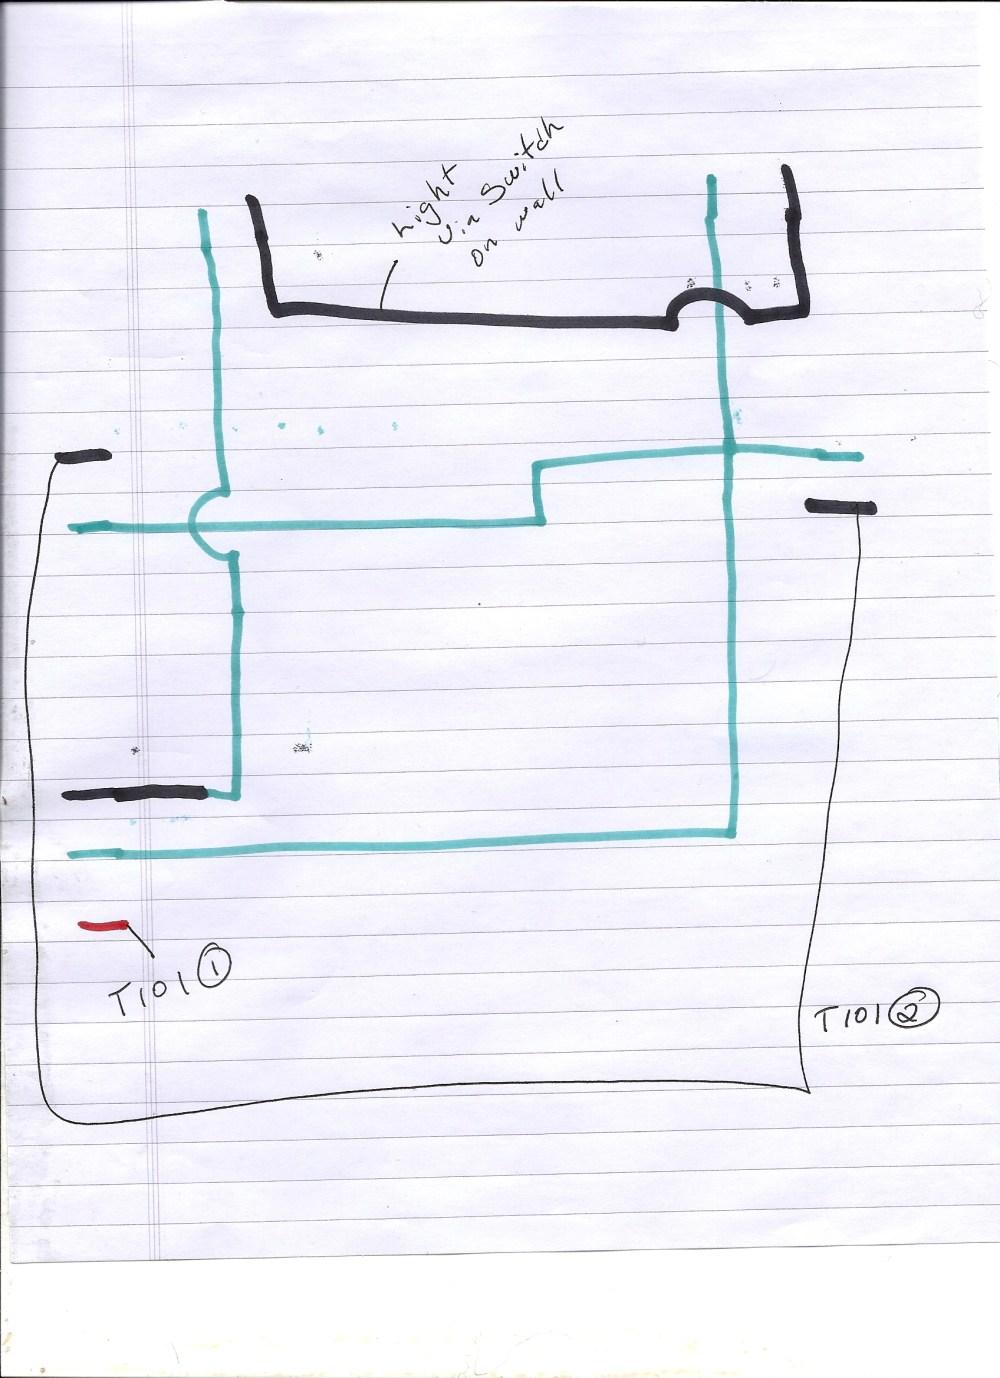 medium resolution of intermatic timer wiring diagram on wiring diagram intermatic t101